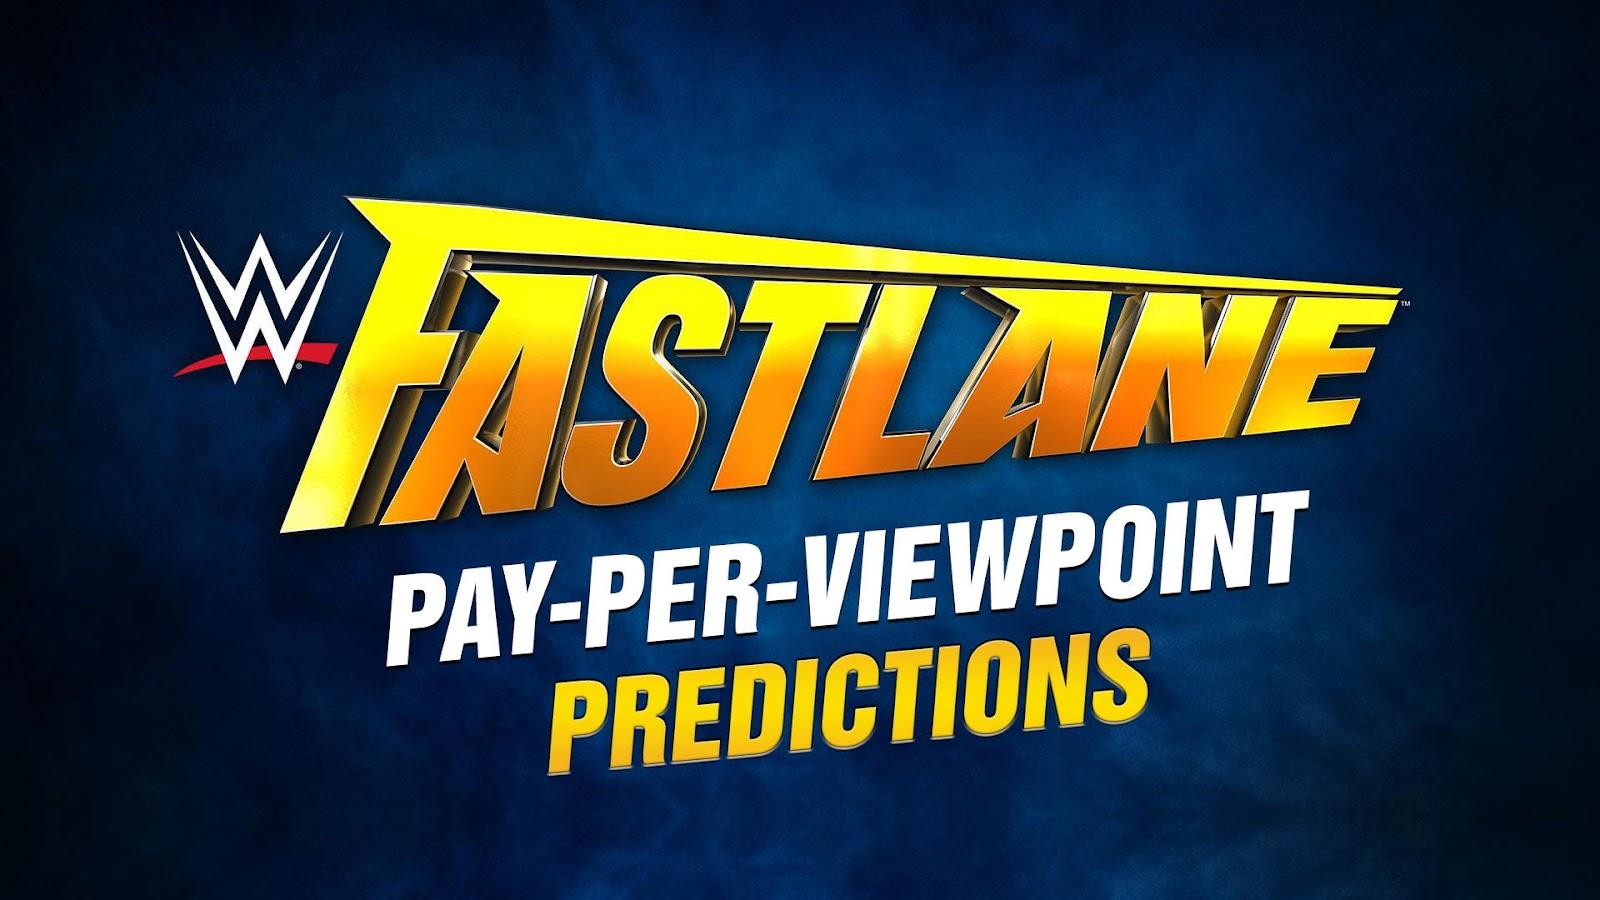 WWE Fastlane 2017 spoilers podcast